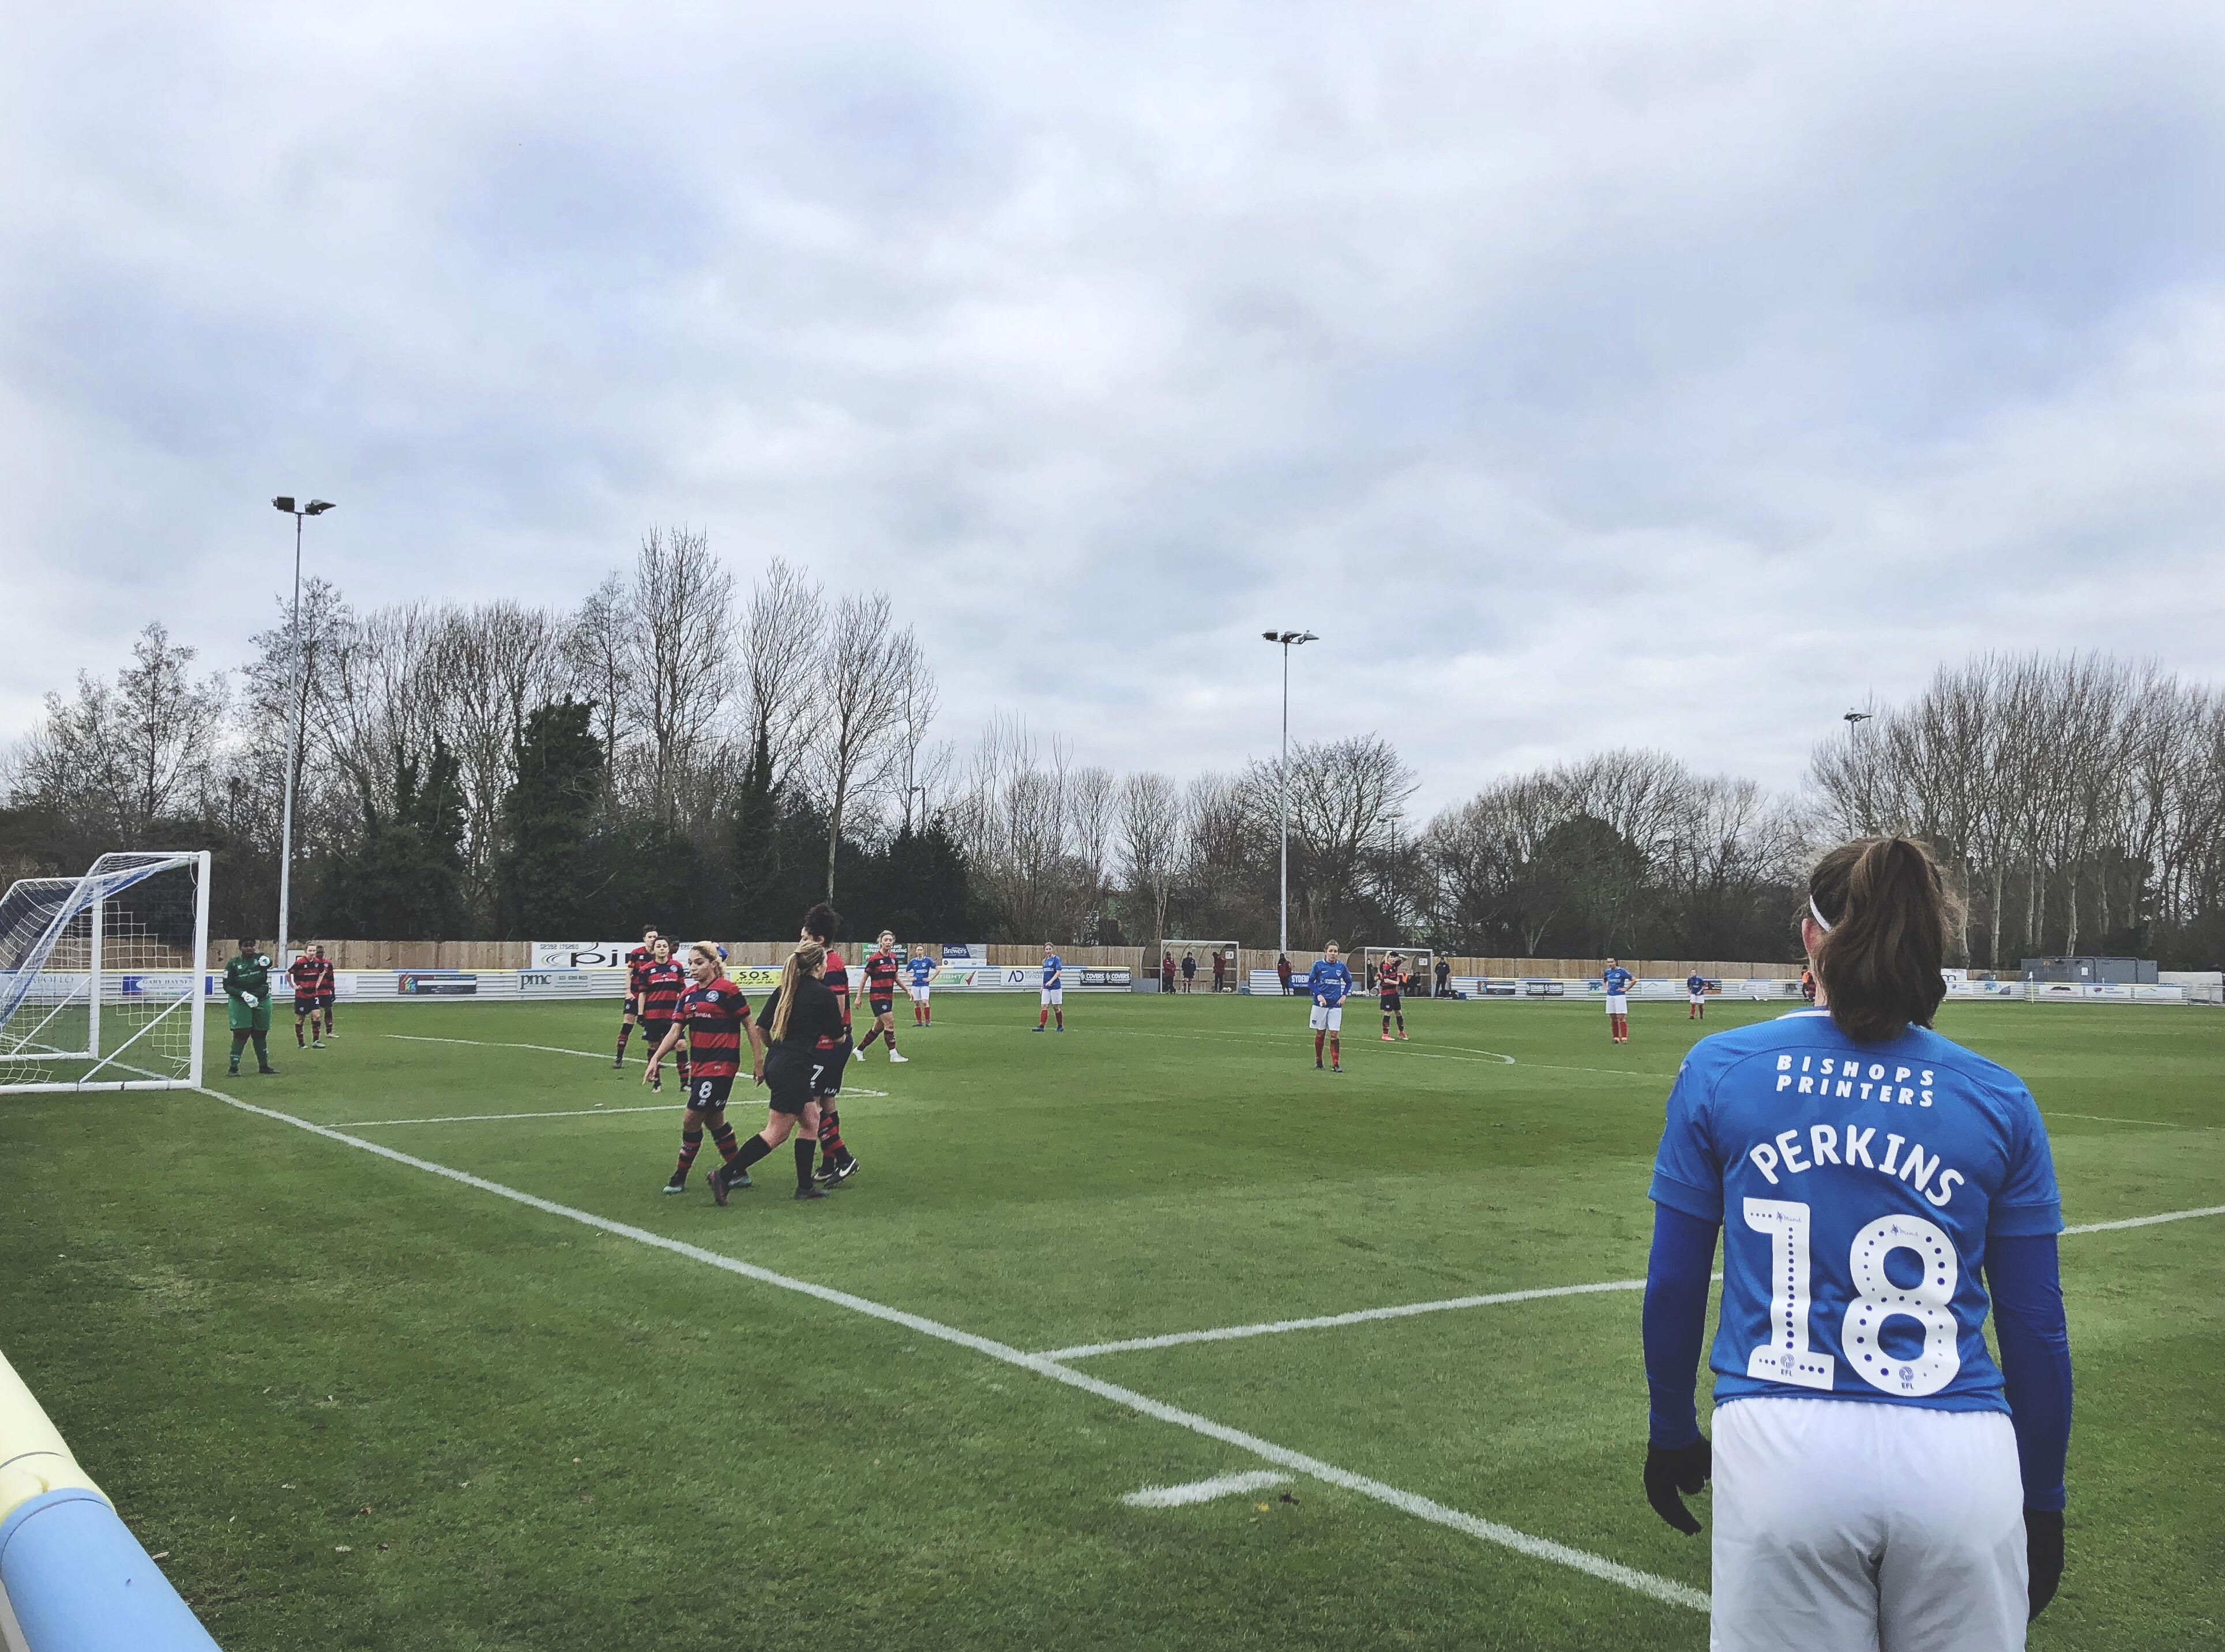 Carla Perkins prepares to take a free kick for Portsmouth Women.